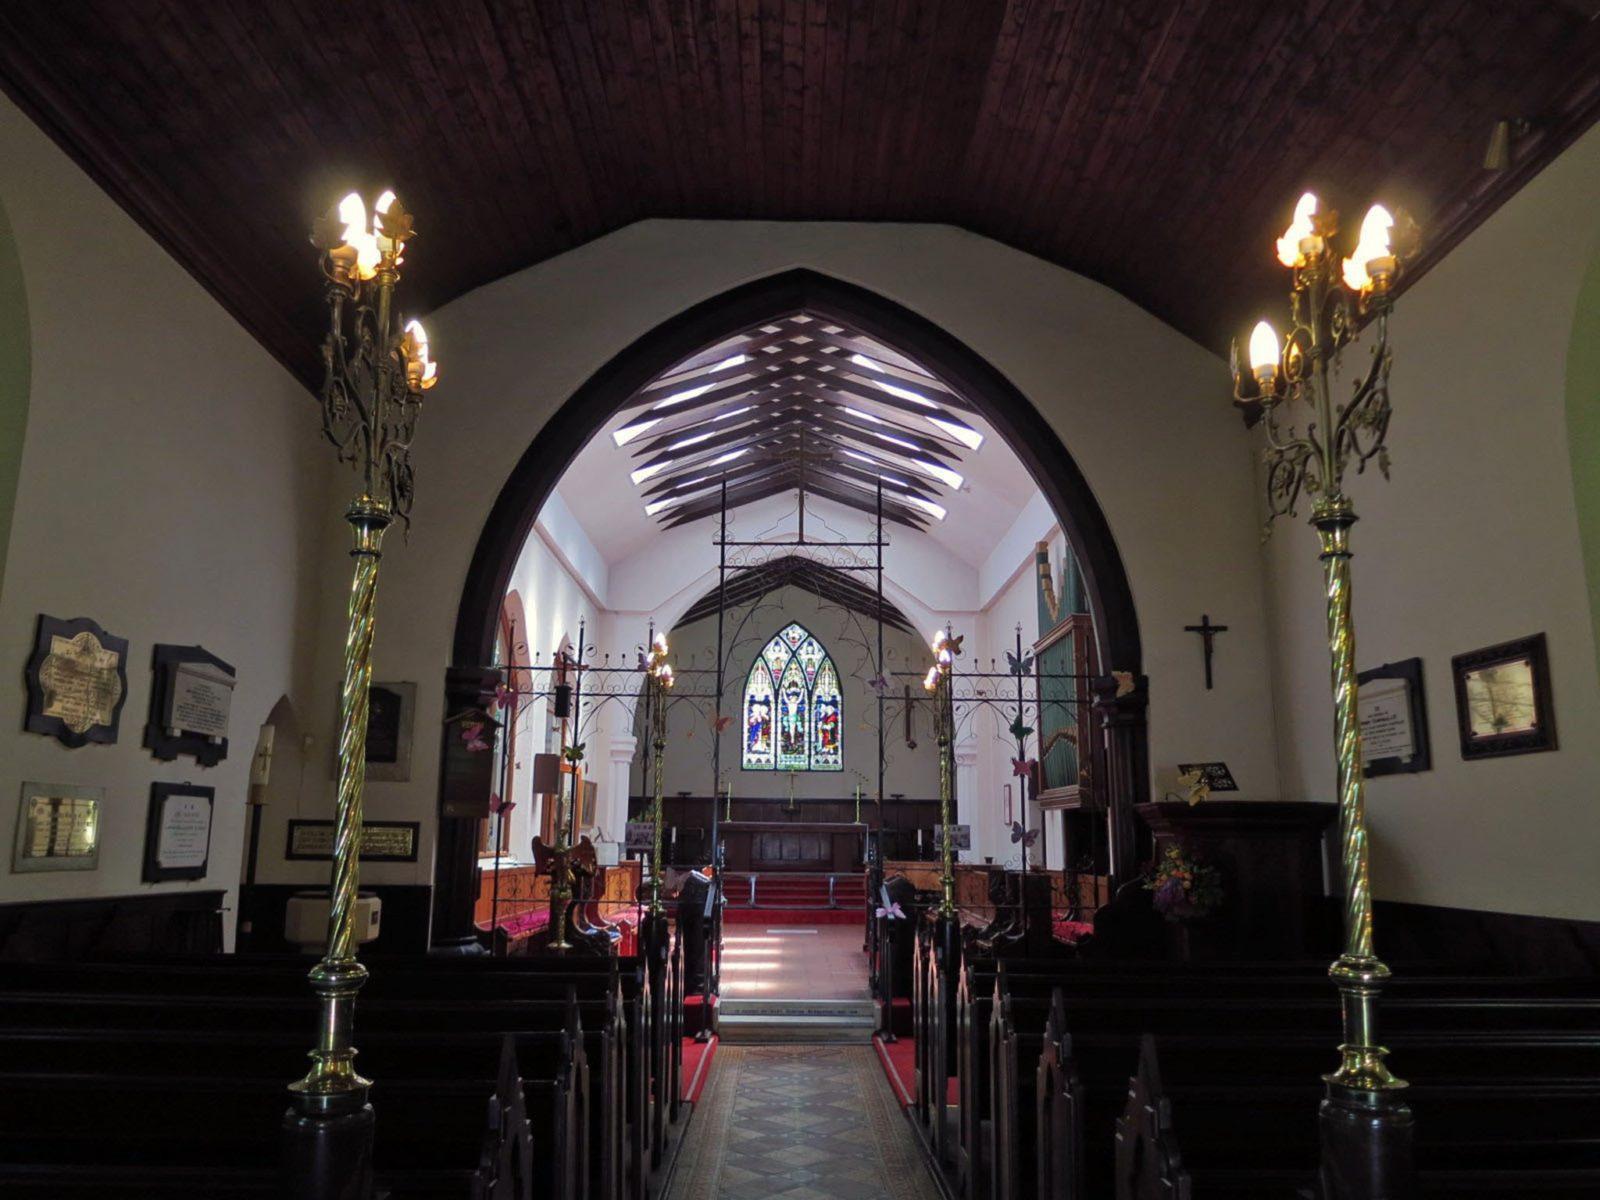 St Johns Church of England, Albany, Western Australia